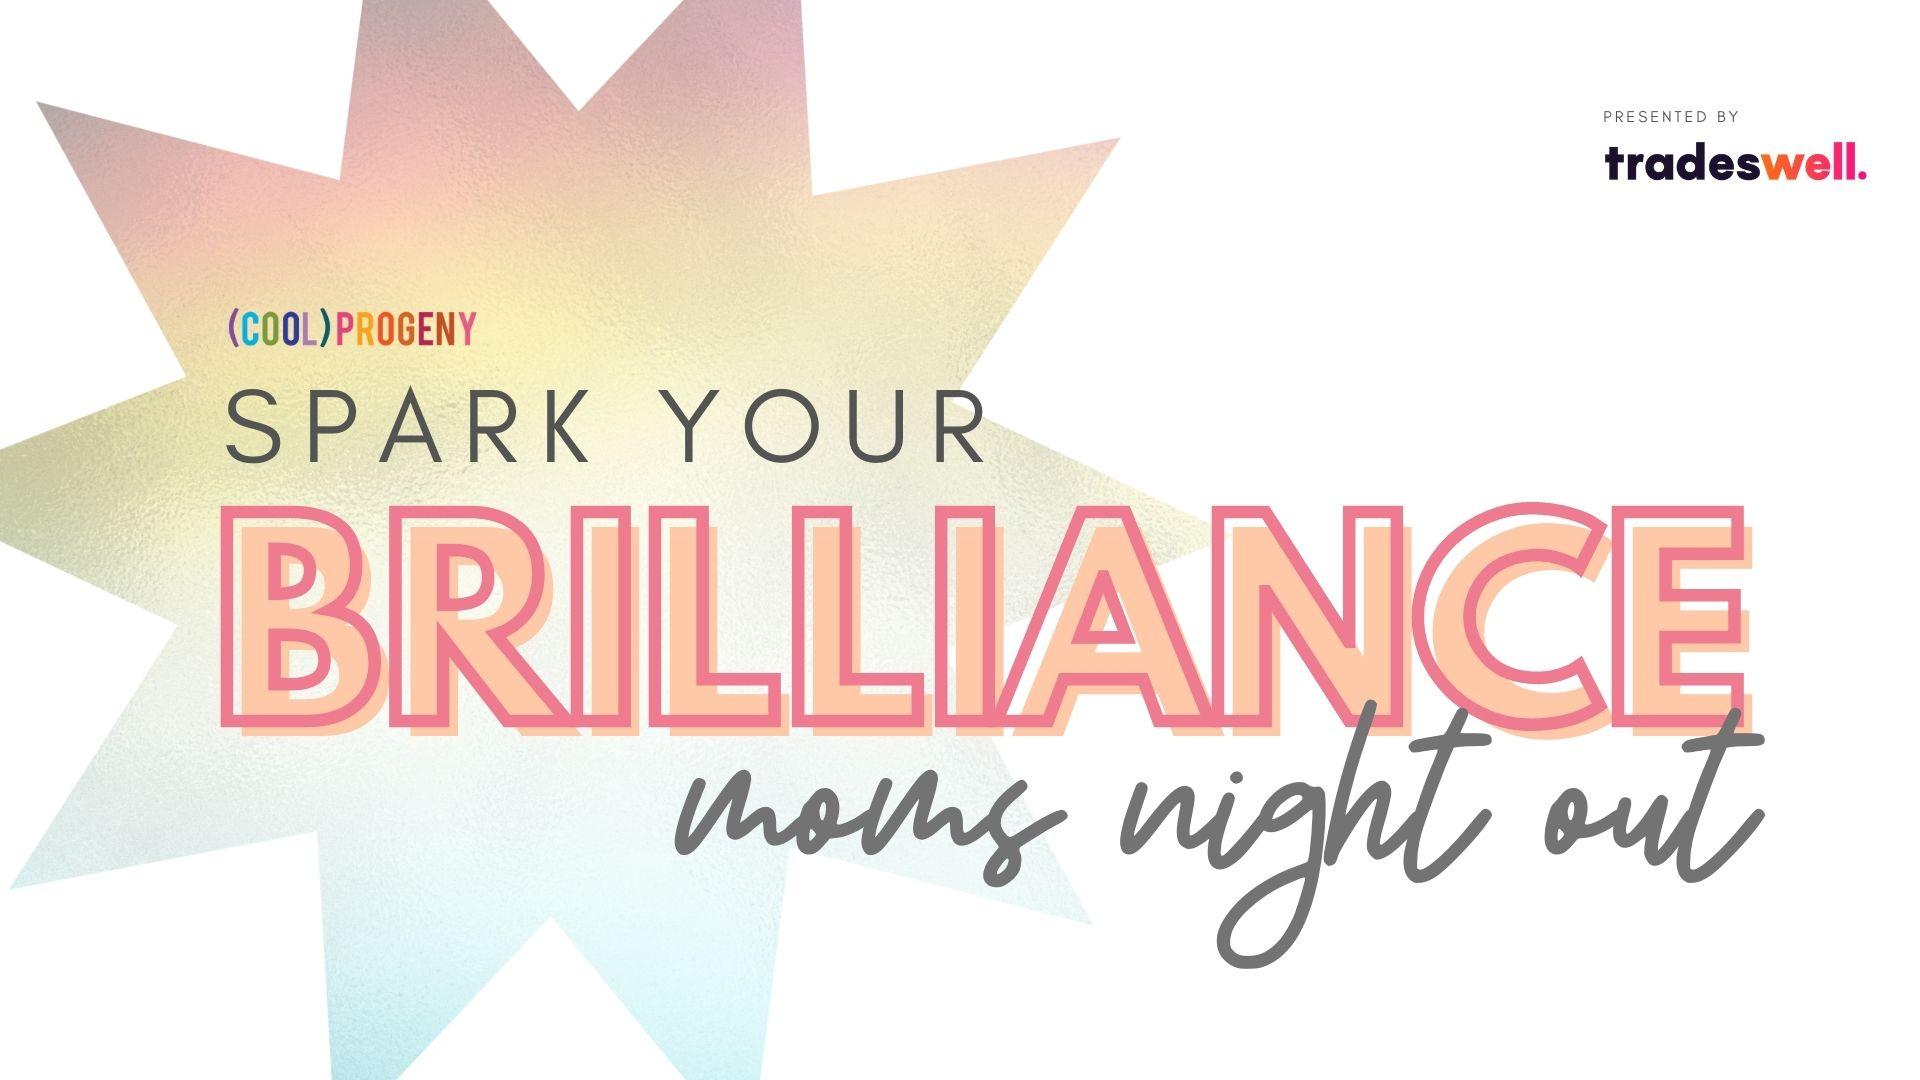 FB EVENT - spark your brilliance (1)